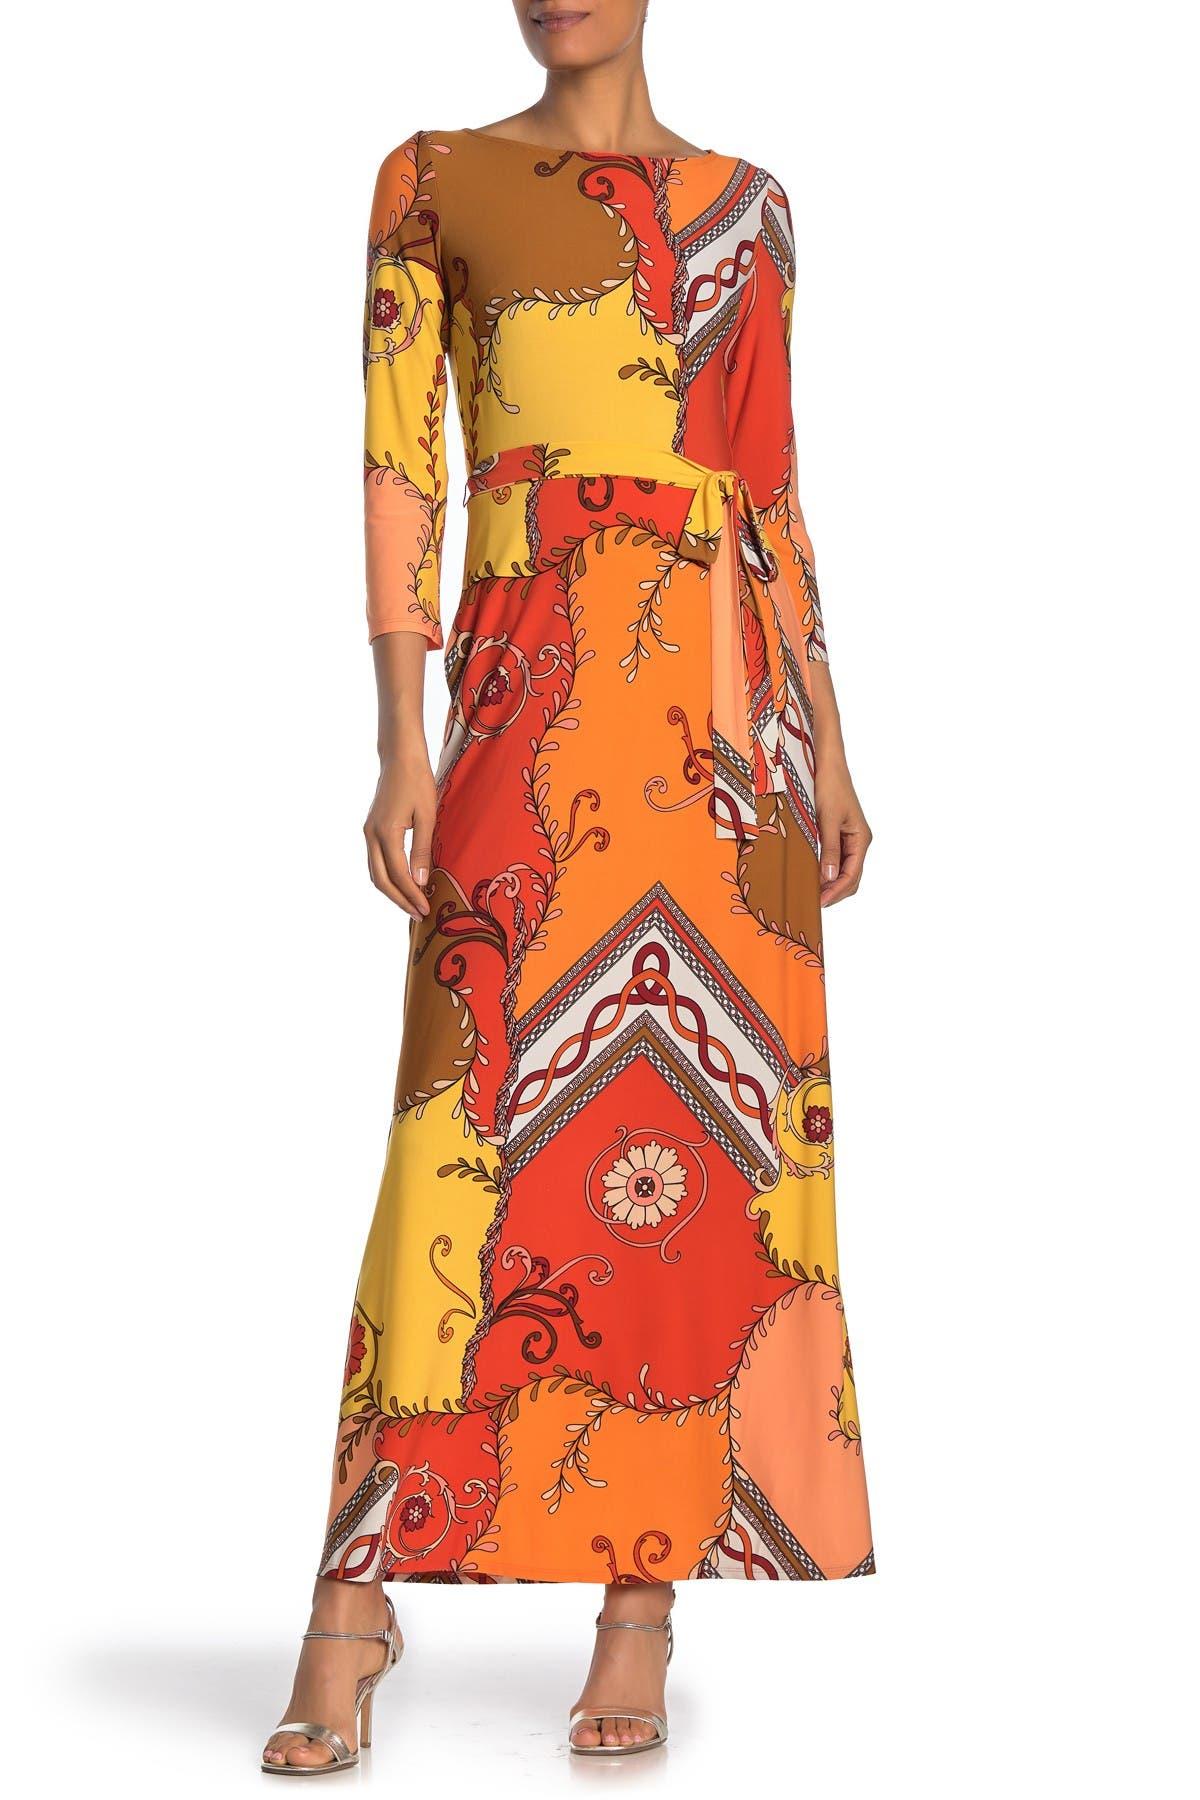 Image of Donna Morgan Geo Print 3/4 Sleeve Maxi Dress